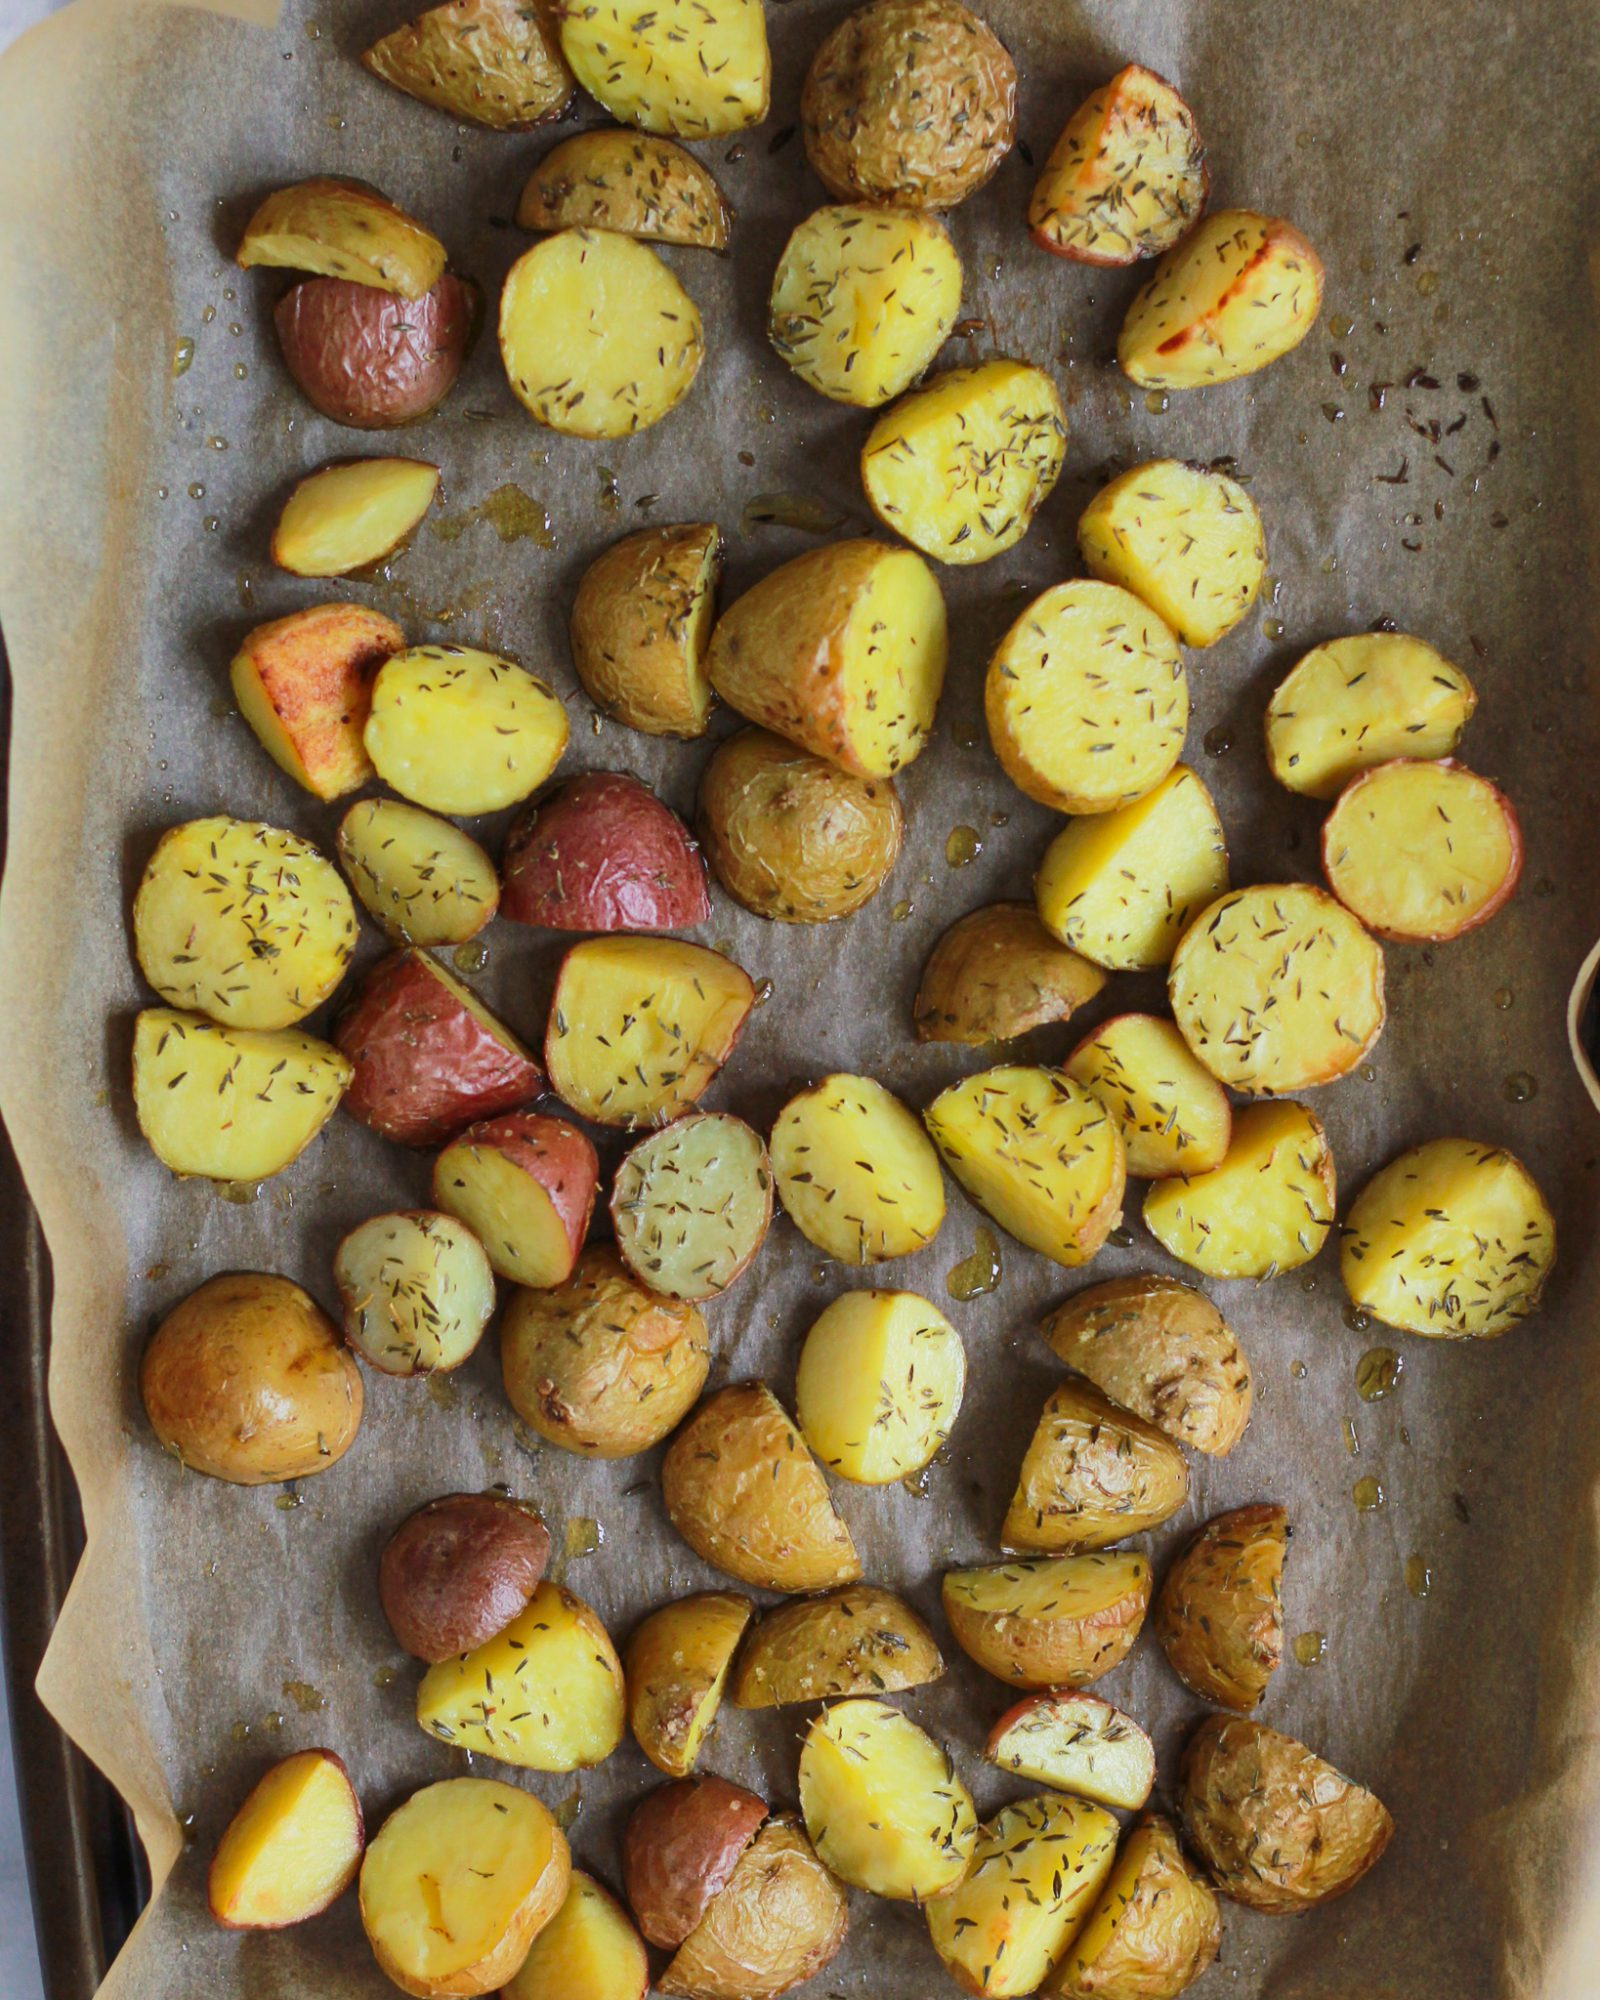 roasted potatoes on pan sheet